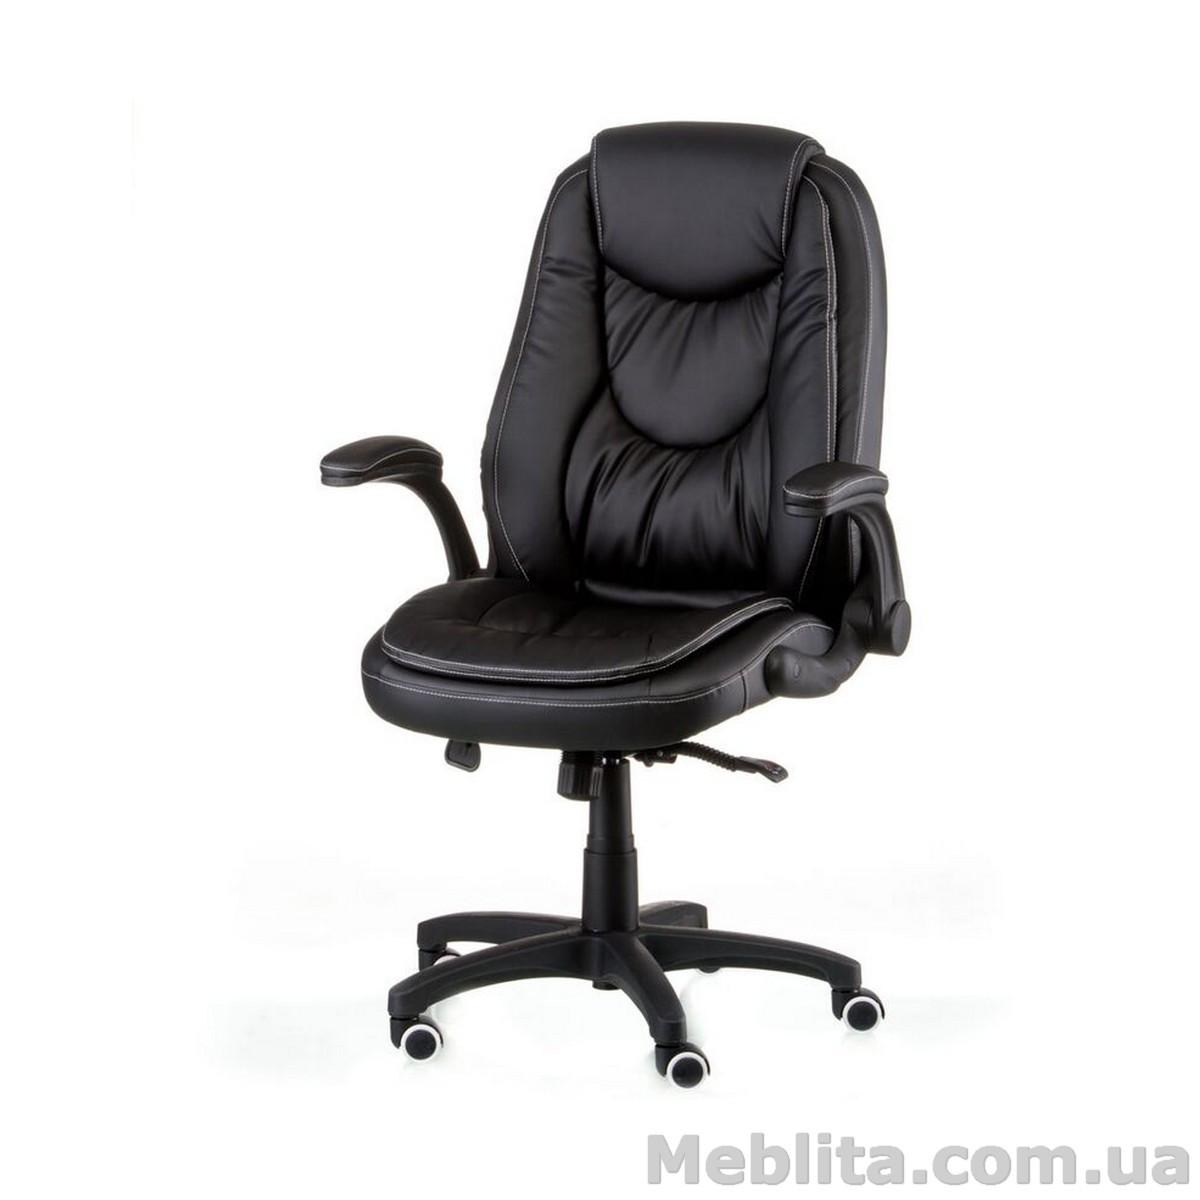 Кресло офисное OSKAR black Special4You